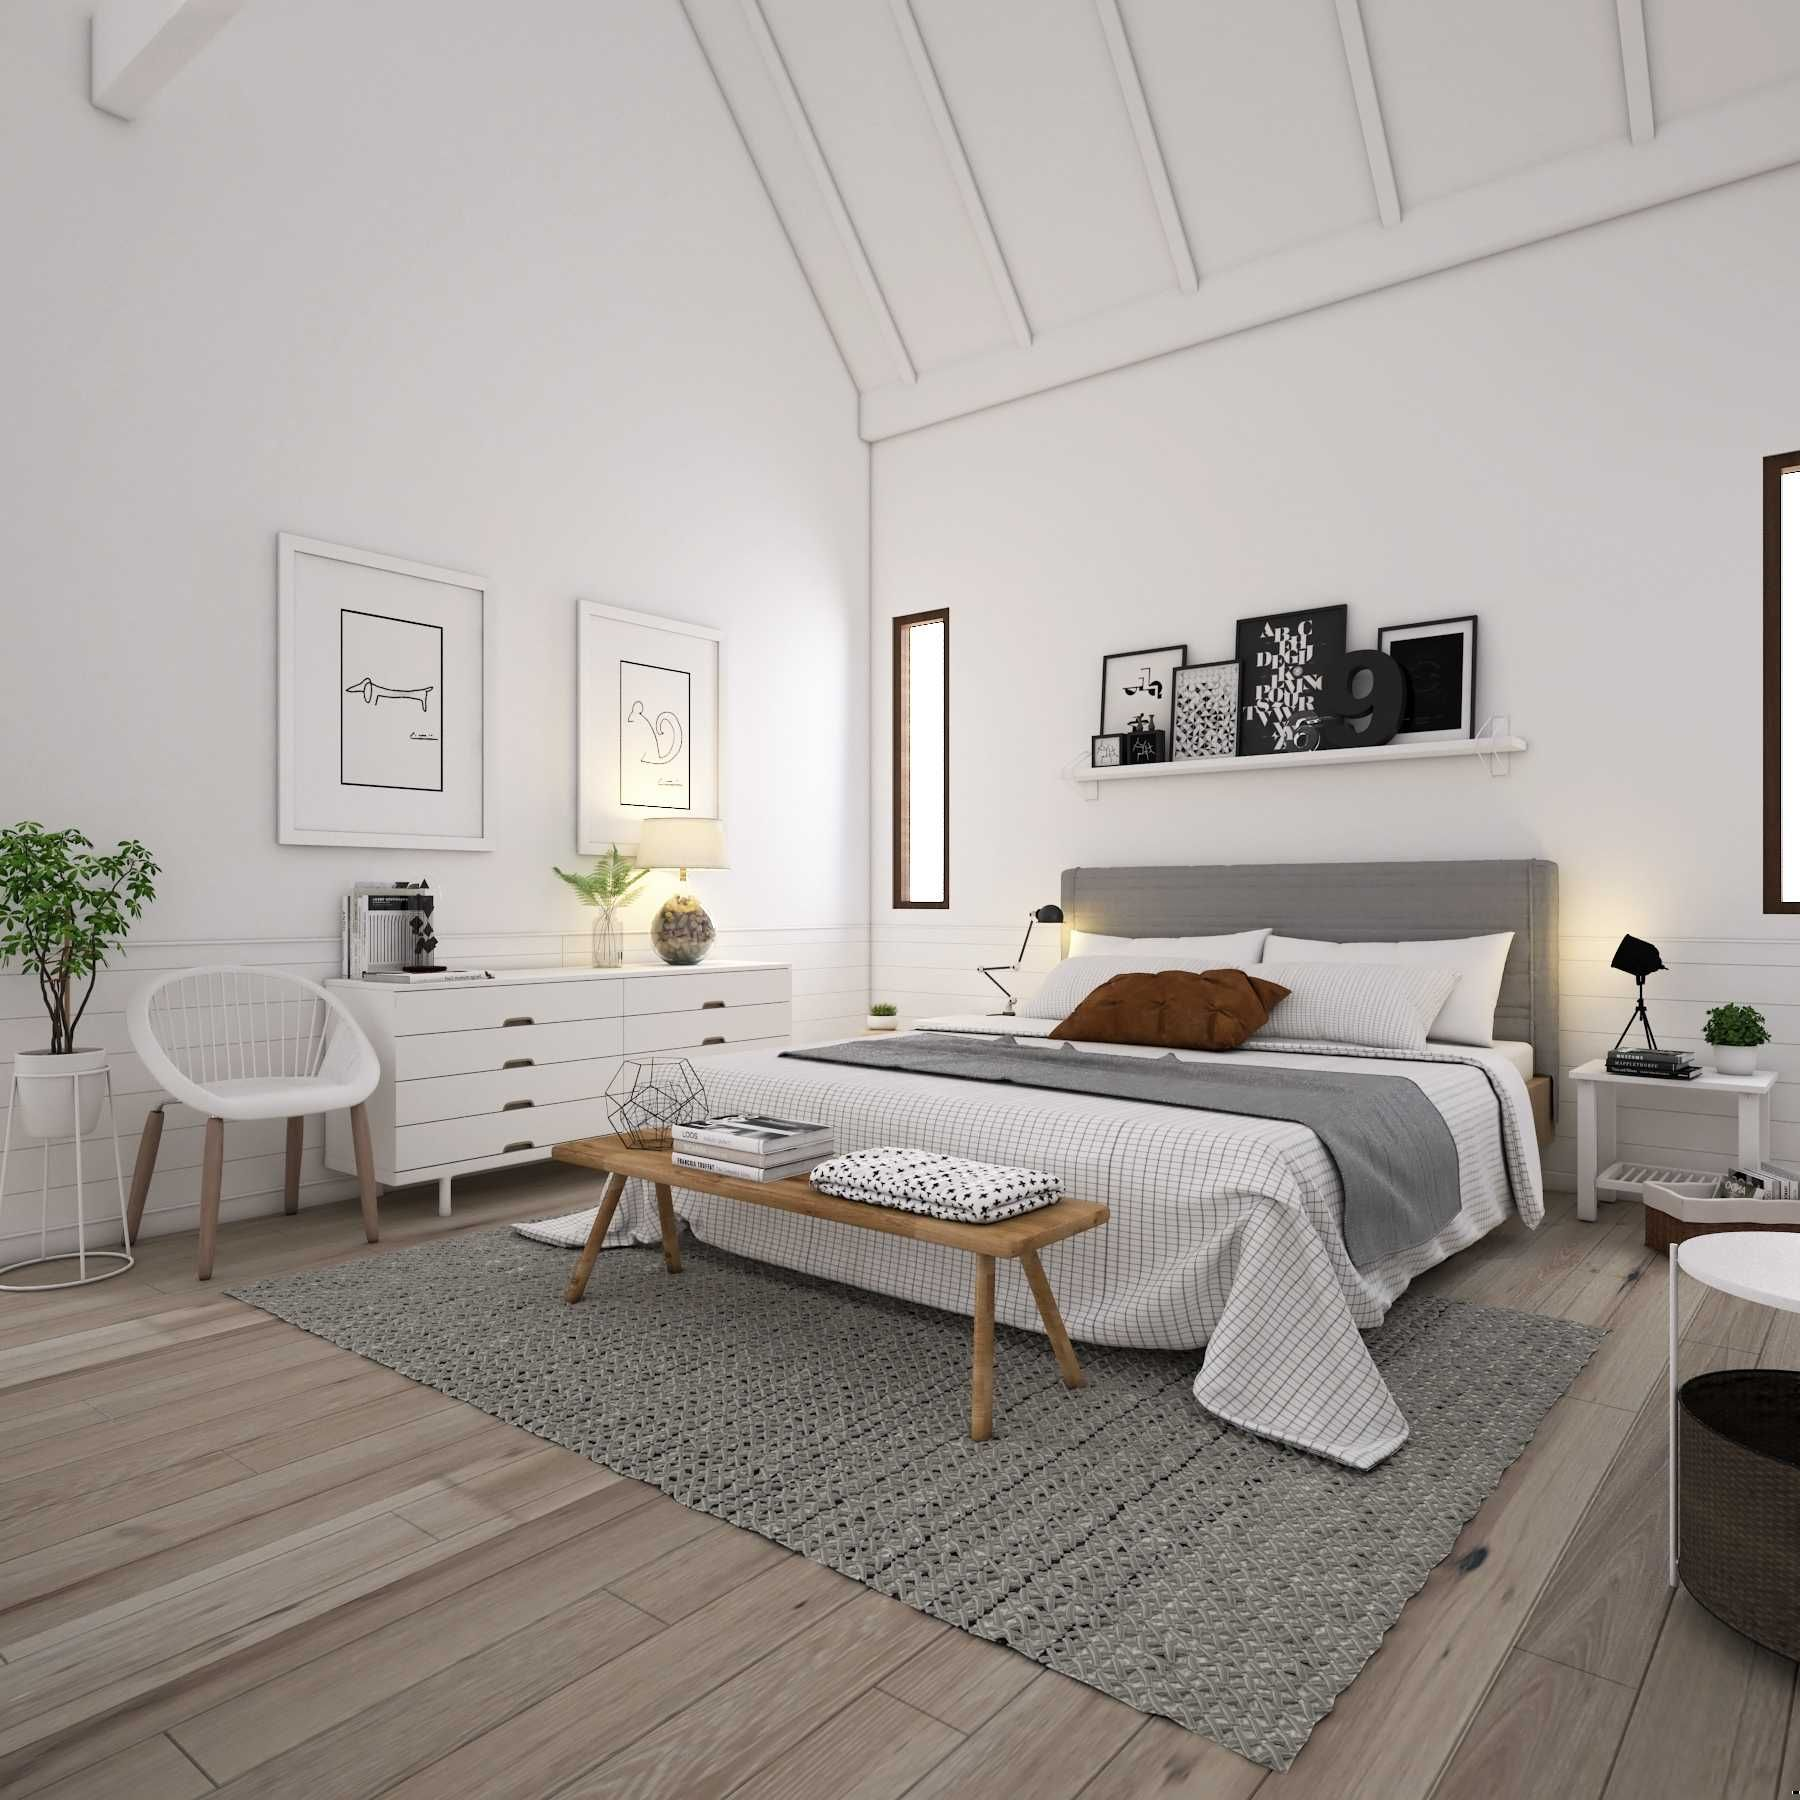 Scandinavia Bedroom Scandinavian House Medan Sumatra Utara La Casa Interior Wood Bedroom Design Master Bedrooms Decor Modern Bedroom Interior